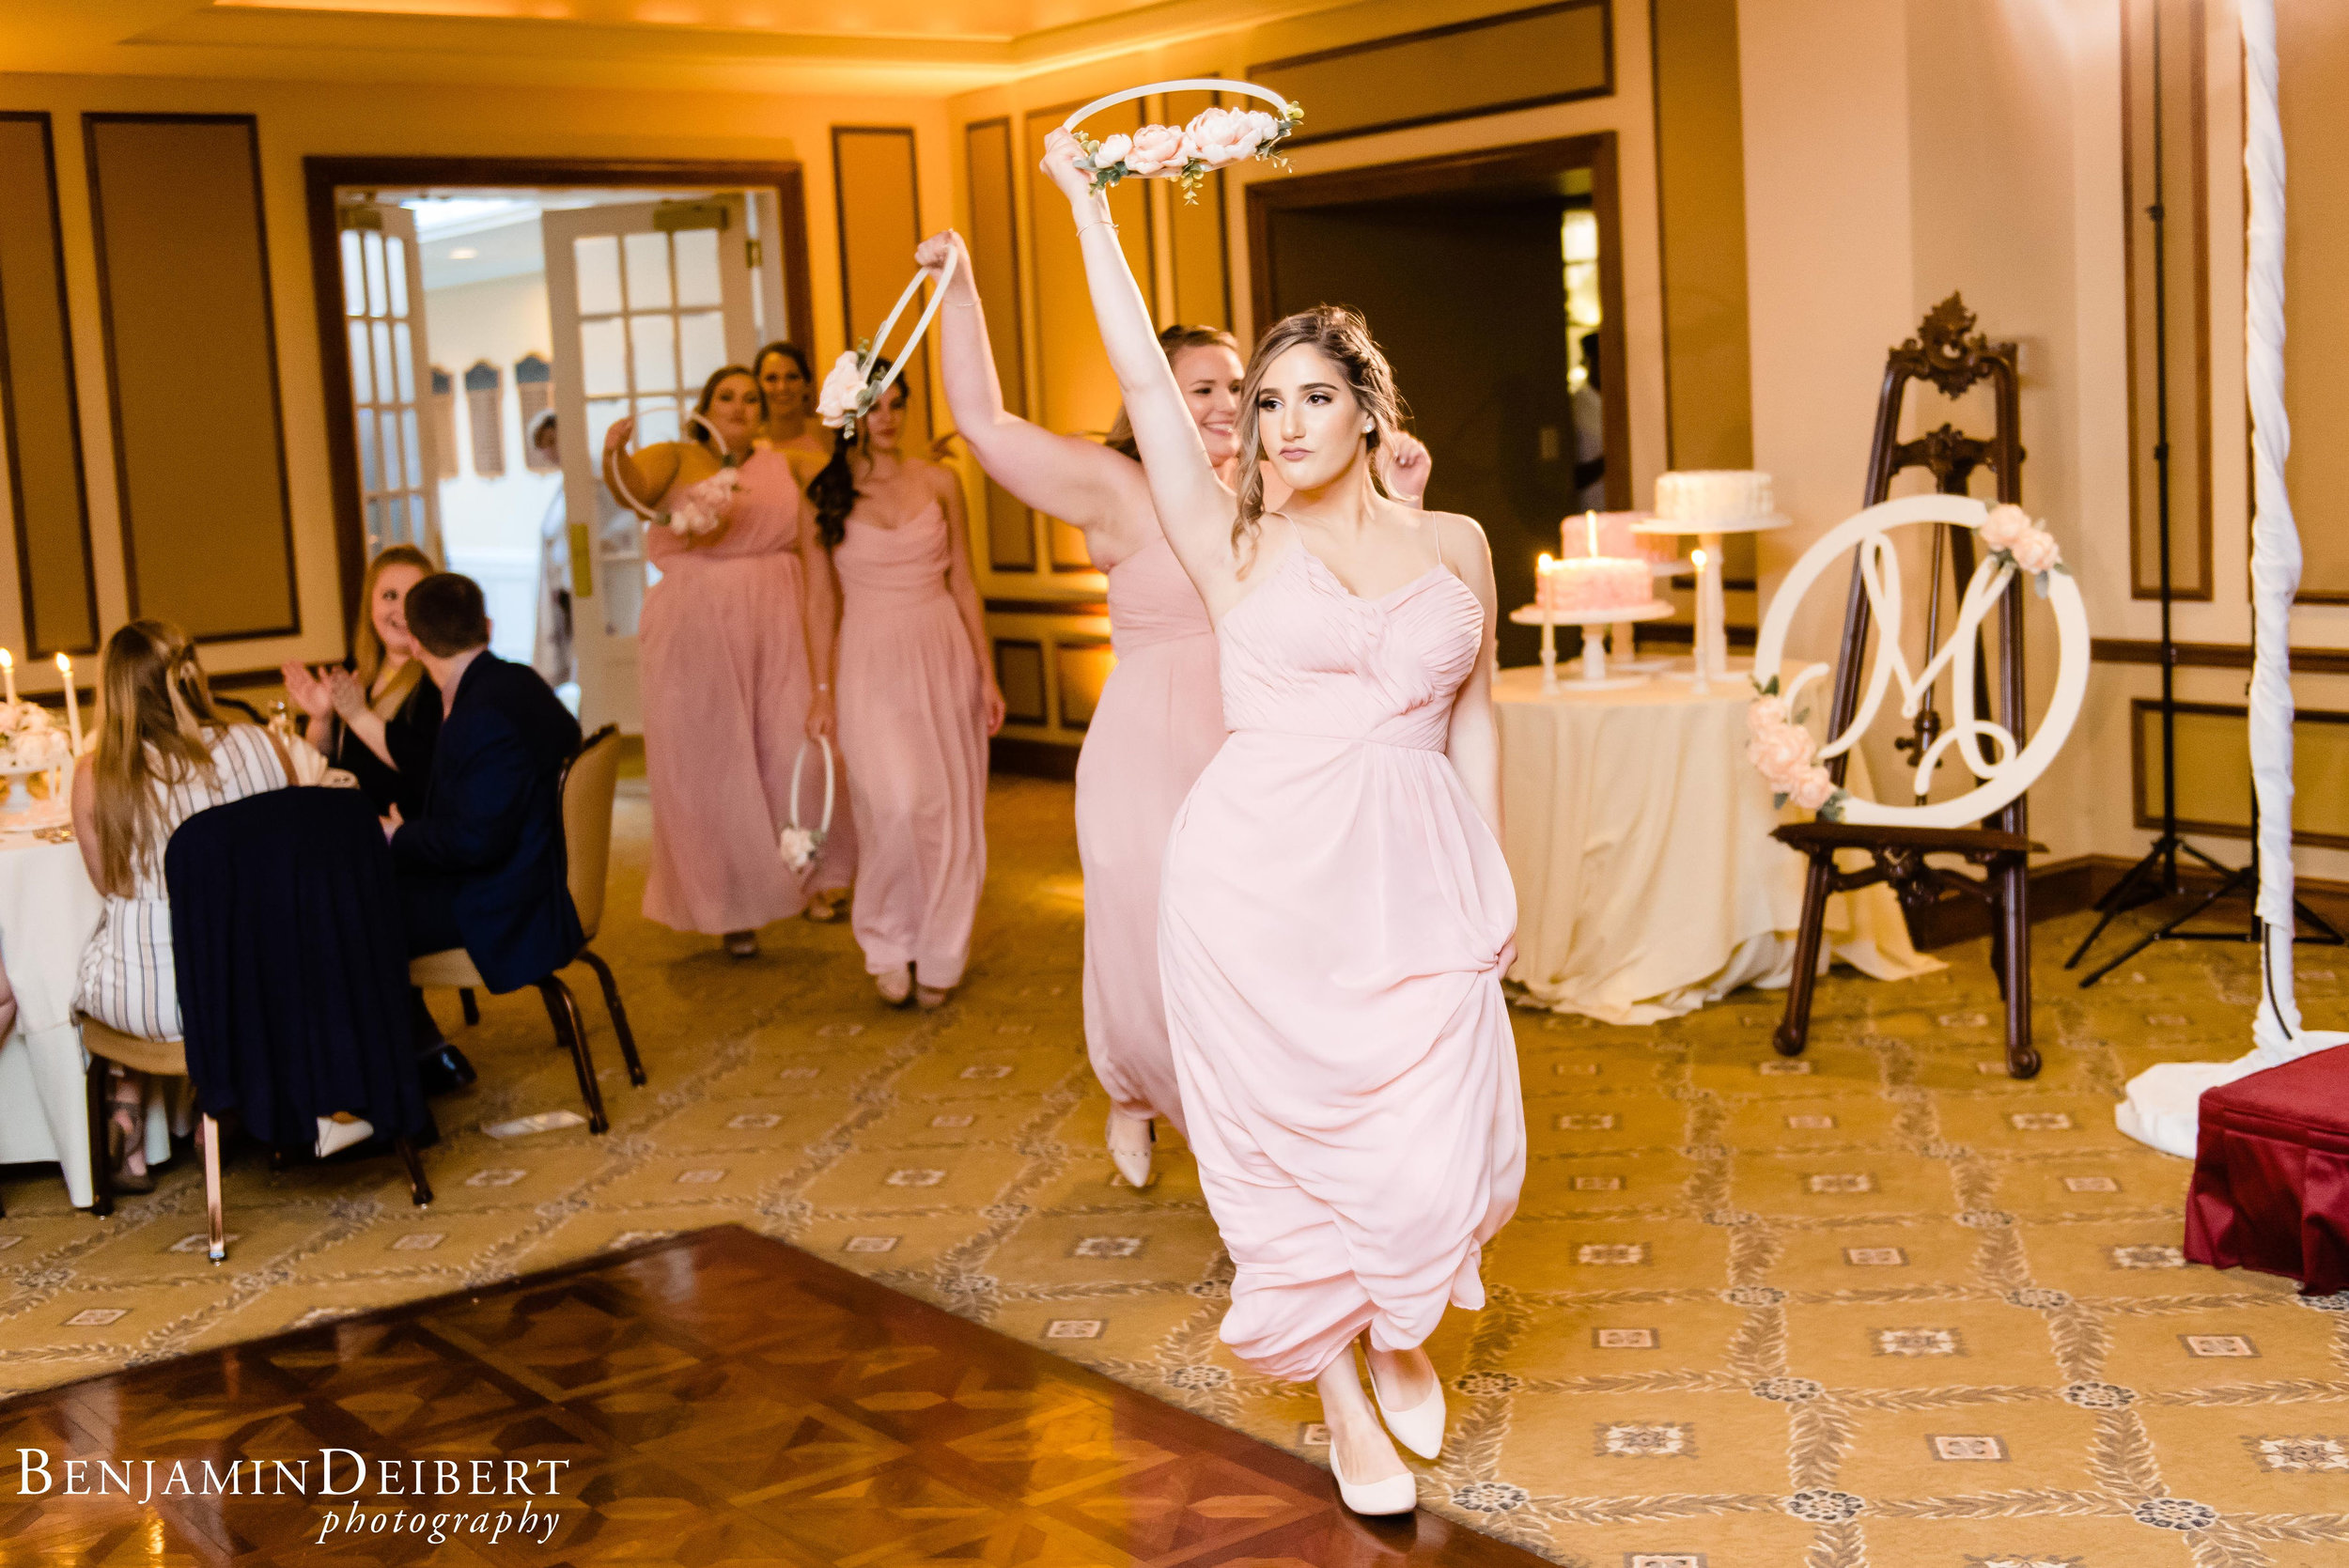 AshleyandDerrick_RadnorValleyCountryClub_Wedding-54.jpg